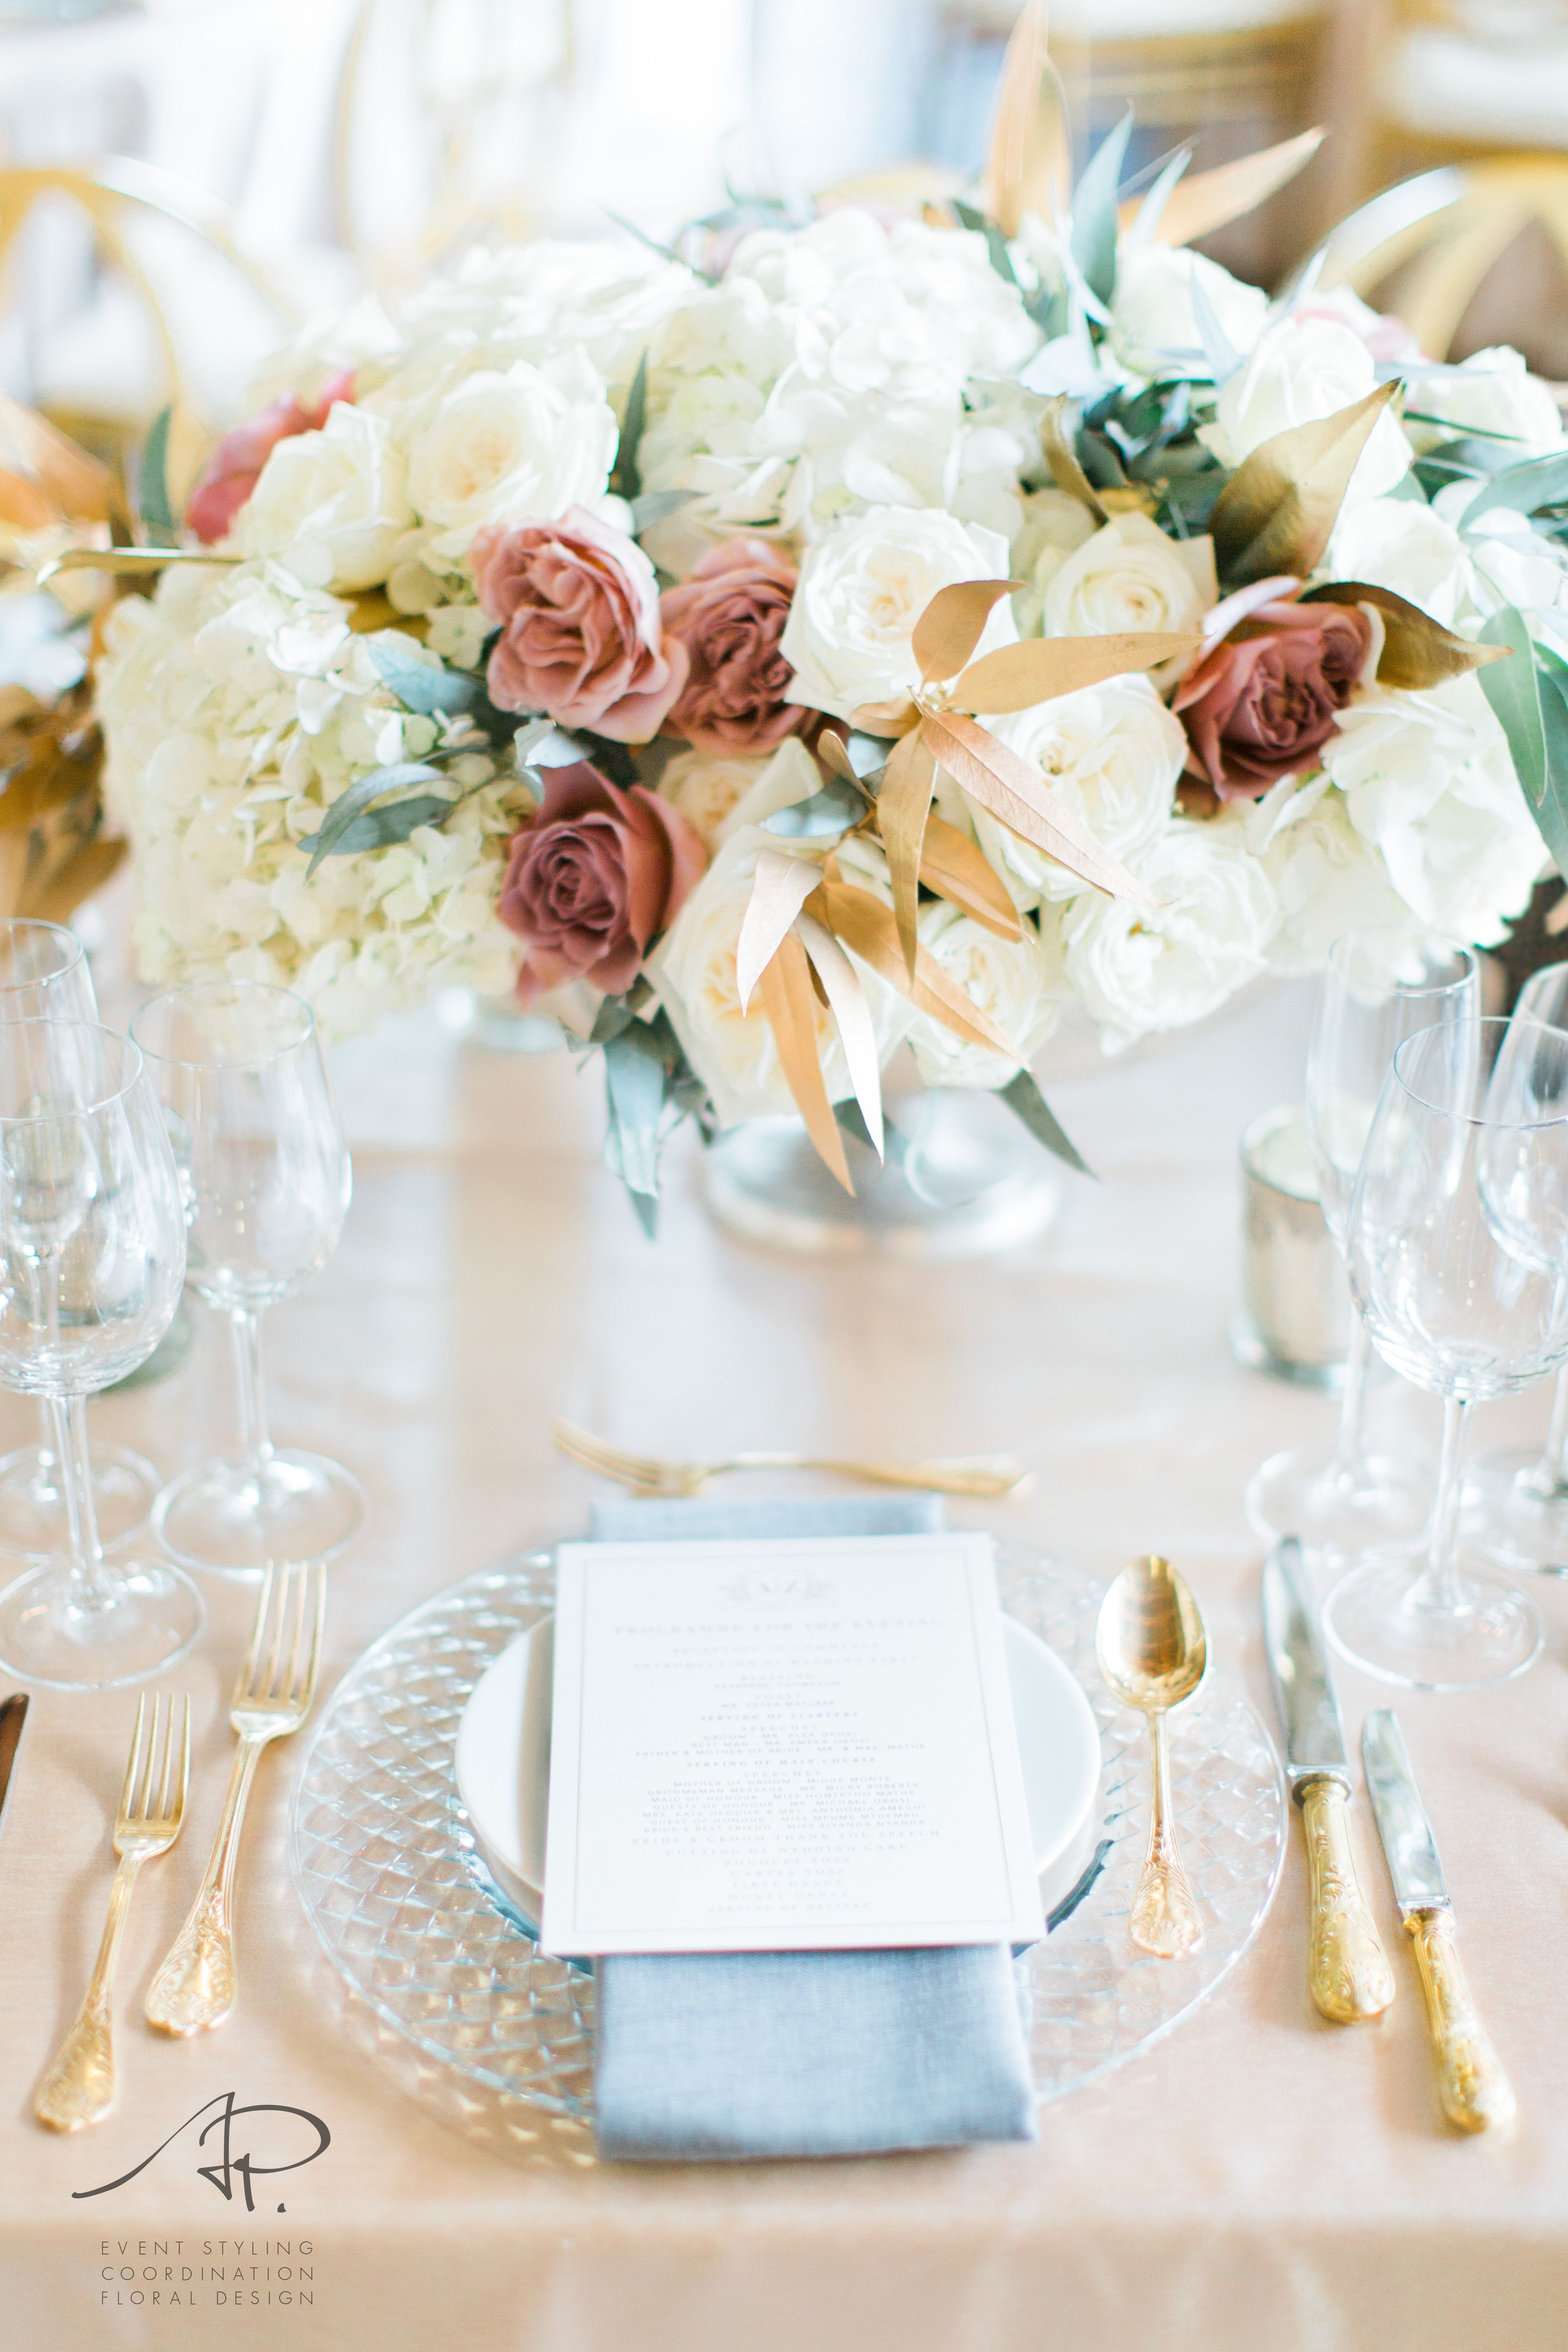 Luxury wedding. Fine Art wedding flowers with huge arrangements ...